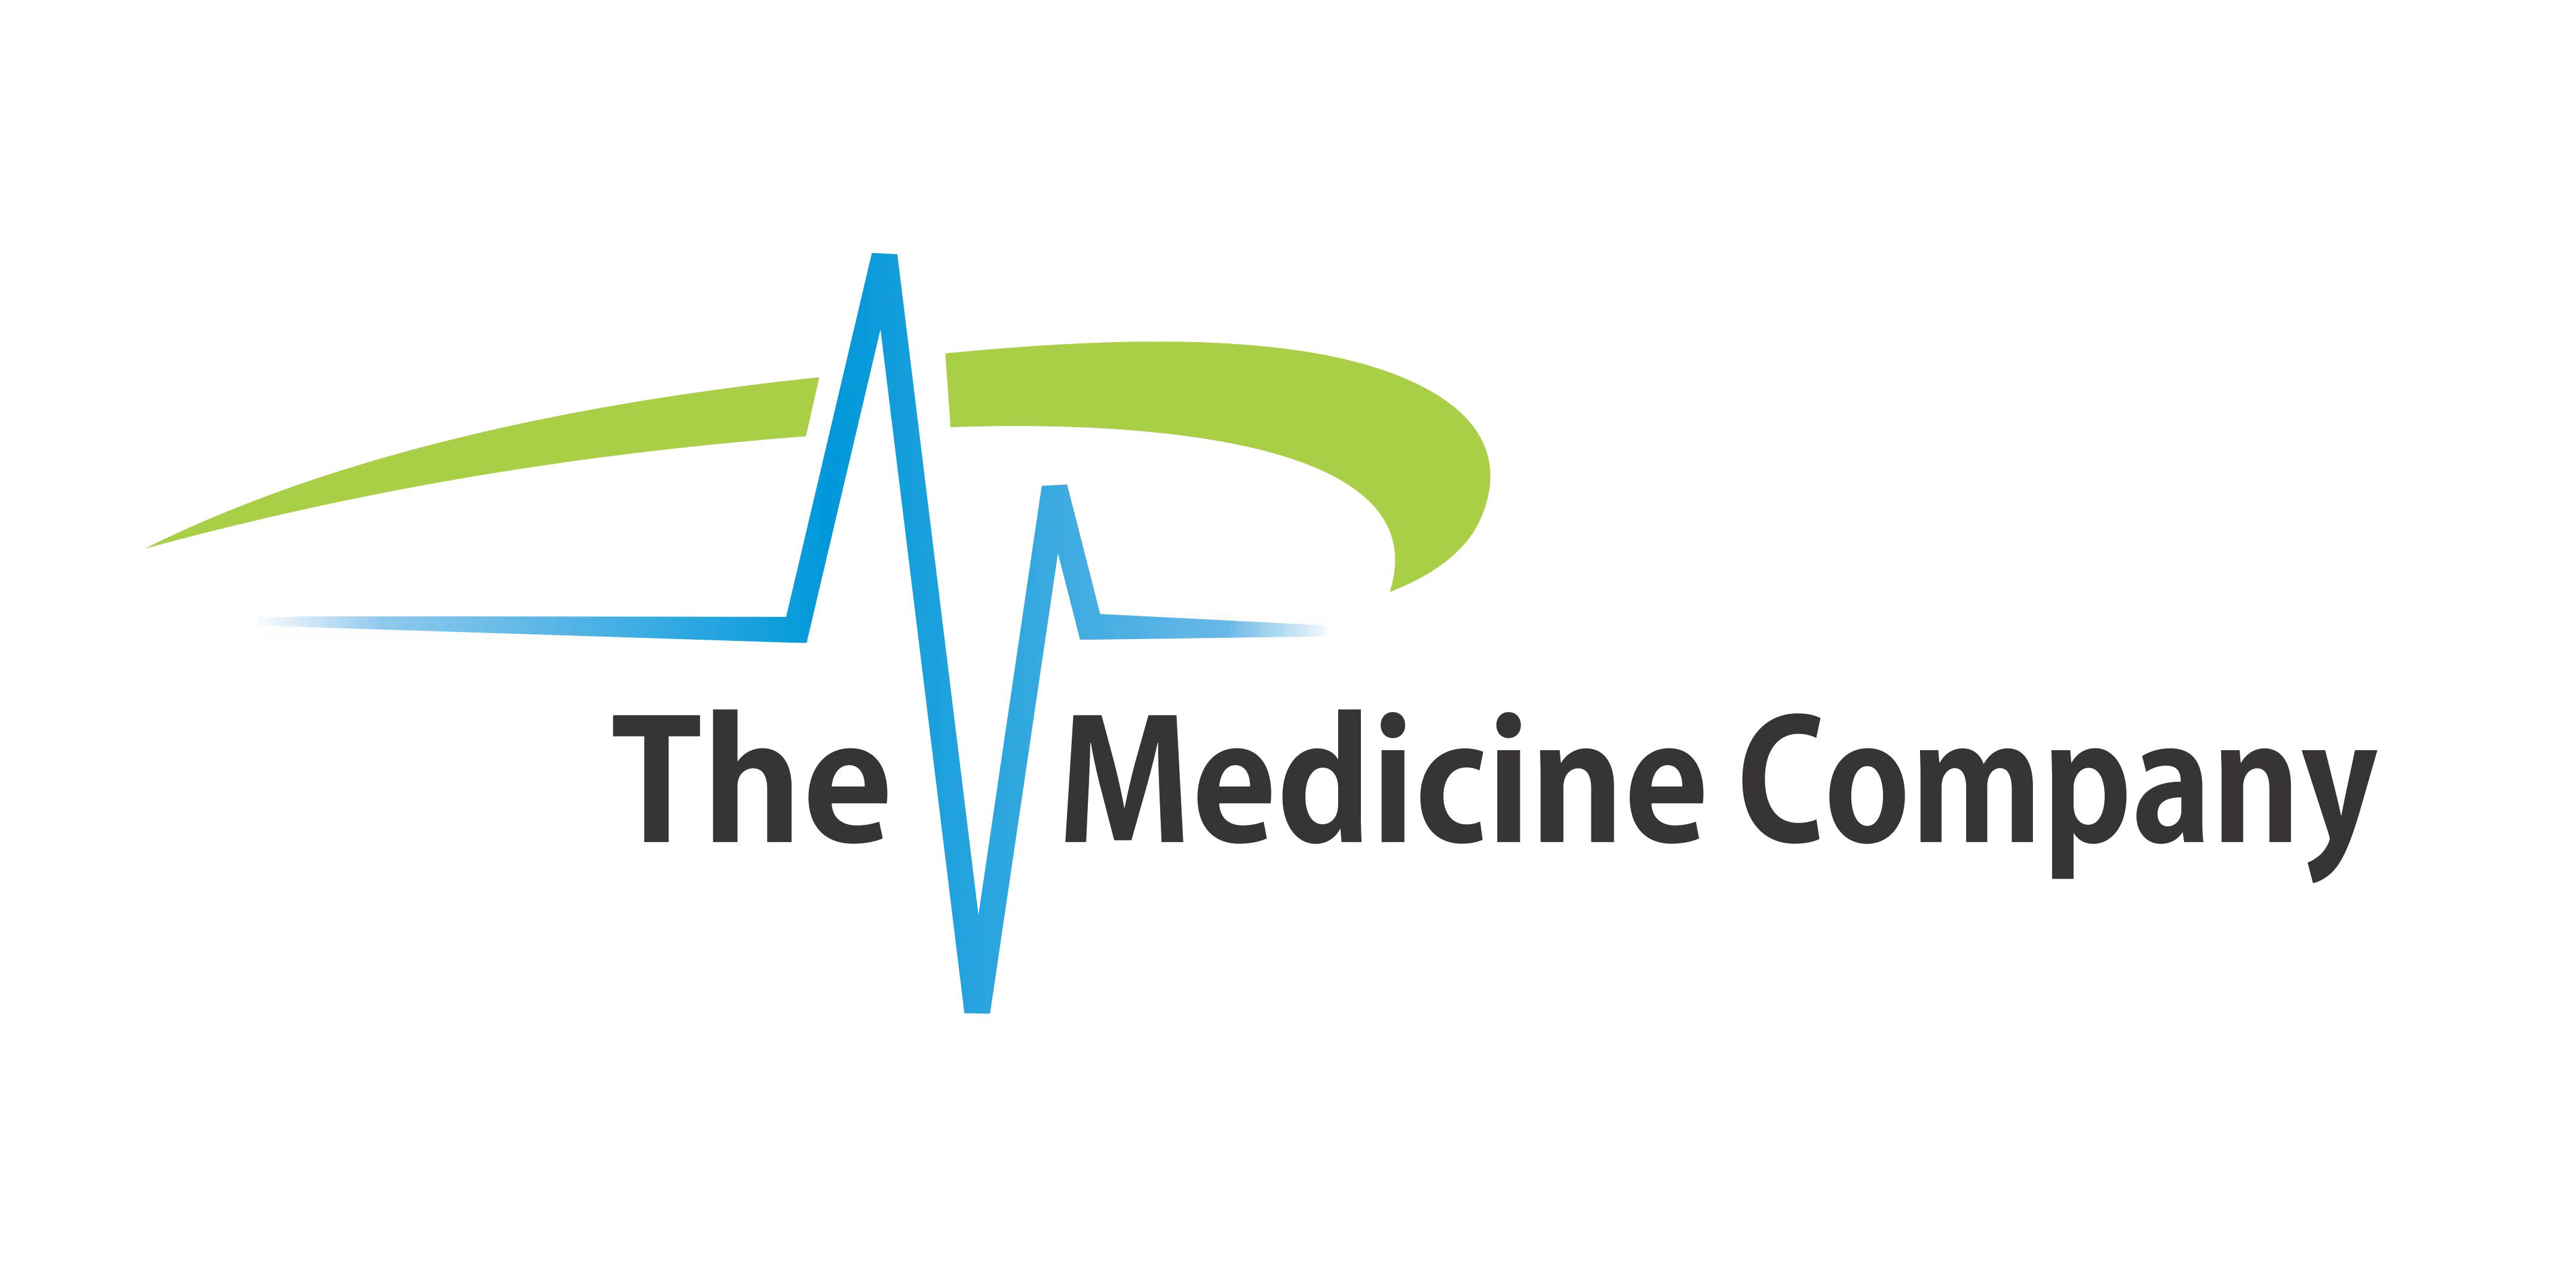 The Medicine Company